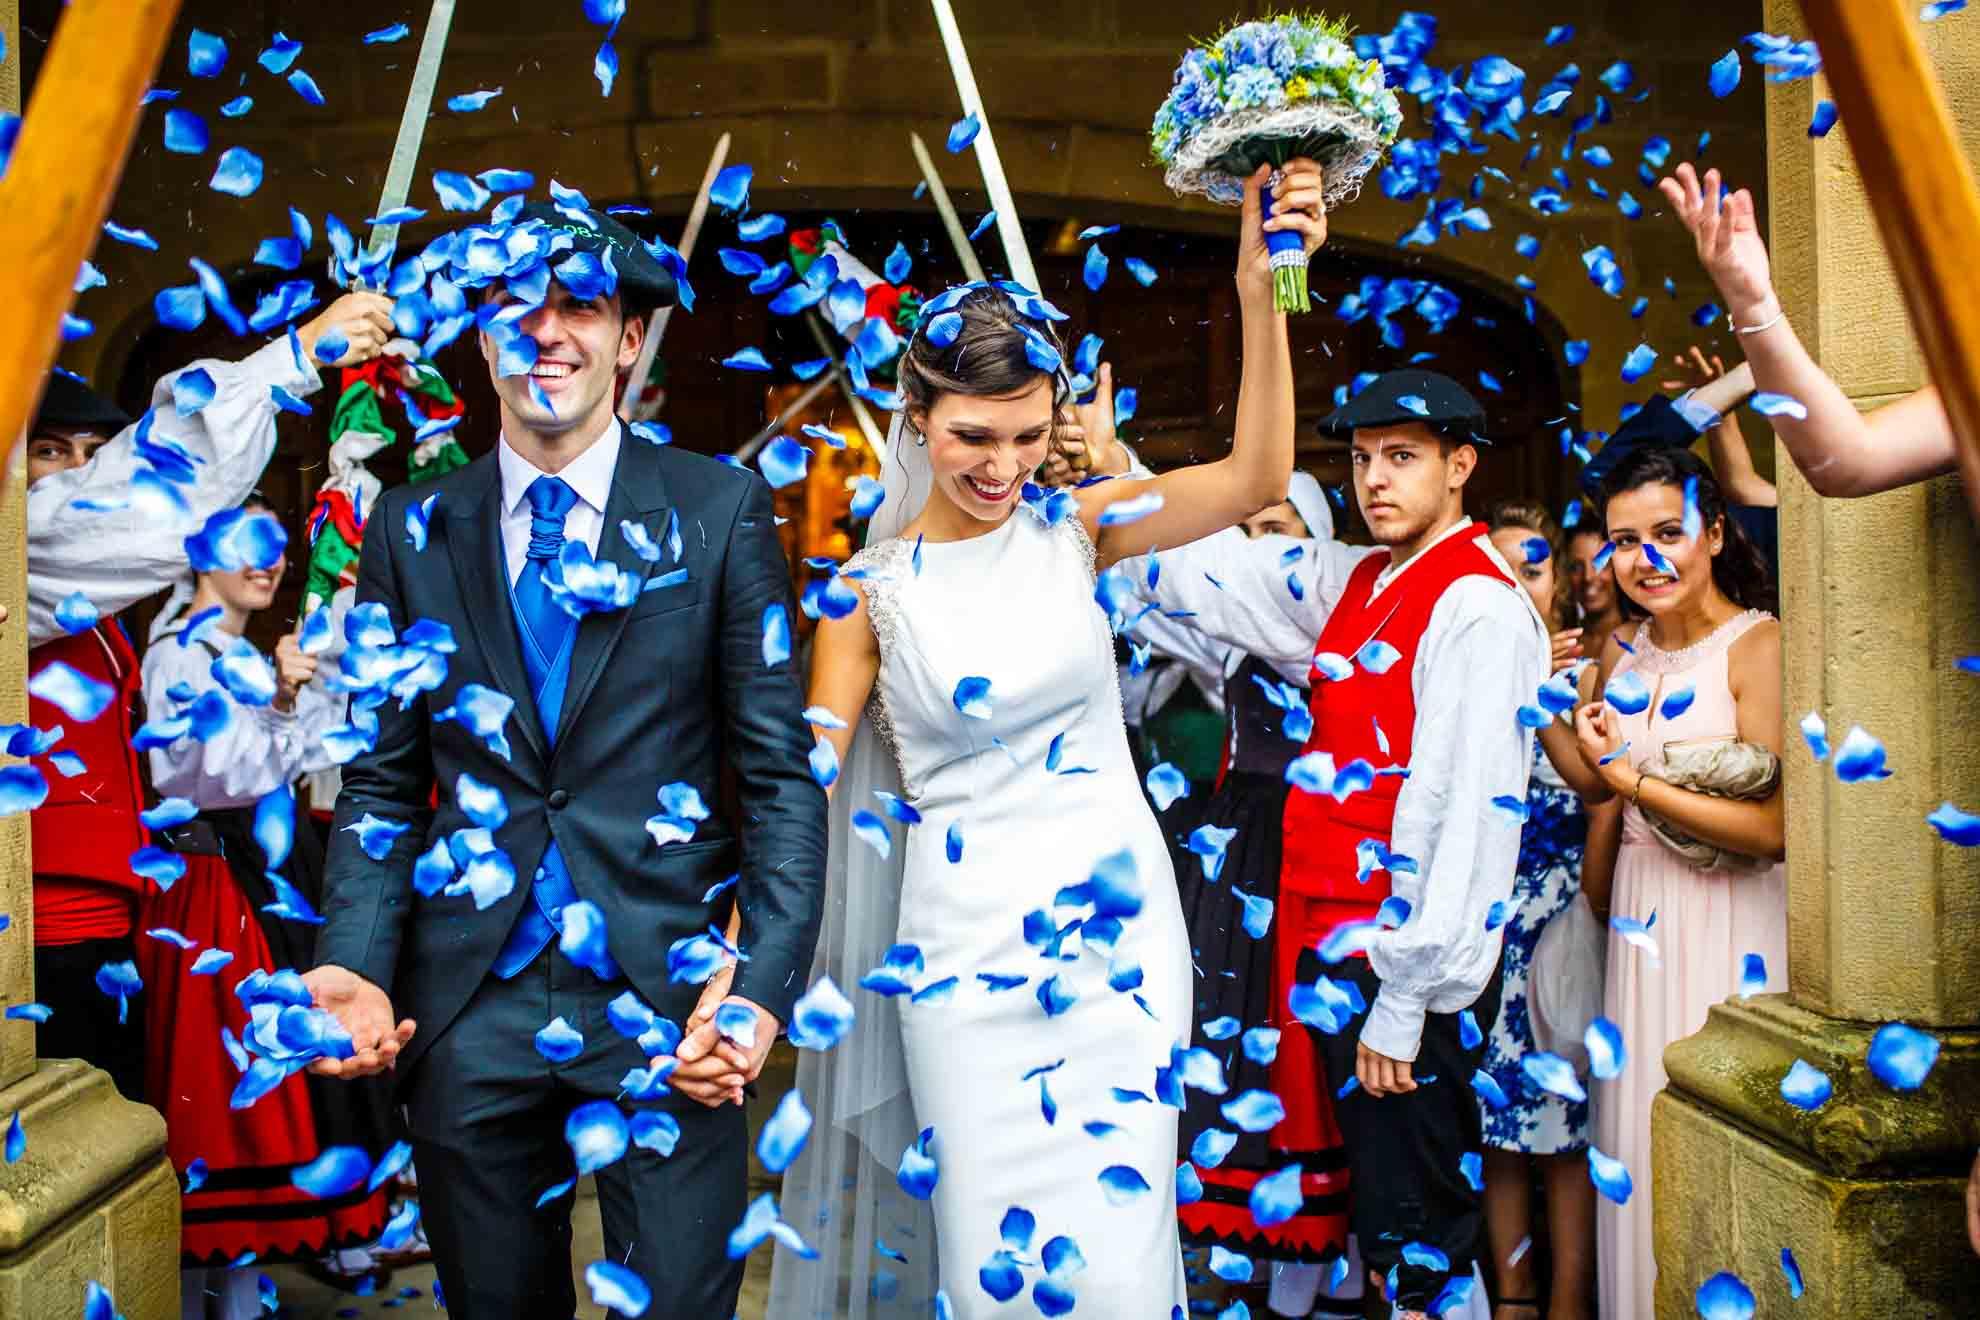 fotografos-de-boda-gipuzkoa-hondarribia-iglesia-guadalupe-reportaje (42)